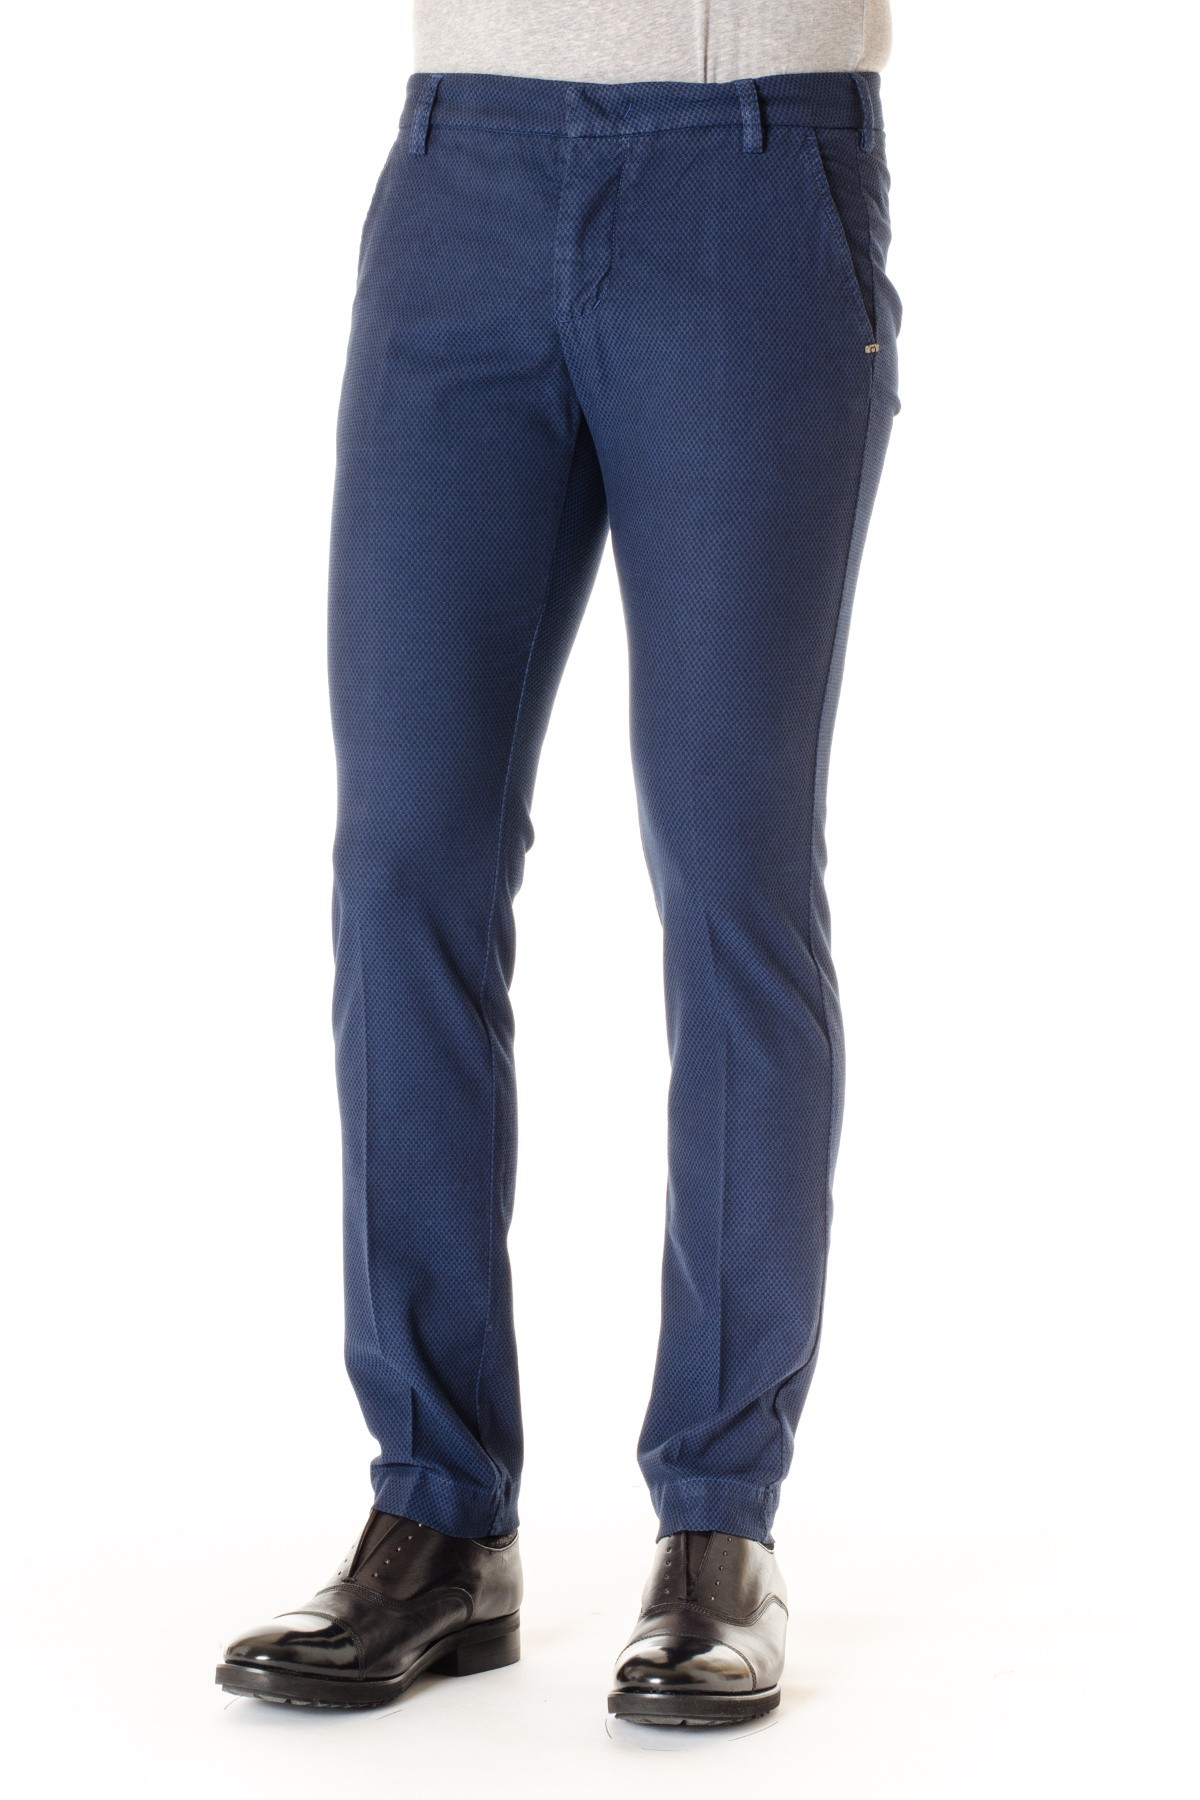 3a9590d7035d5 Pantaloni in cotone A I per uomo ENTRE AMIS blu - Rione Fontana